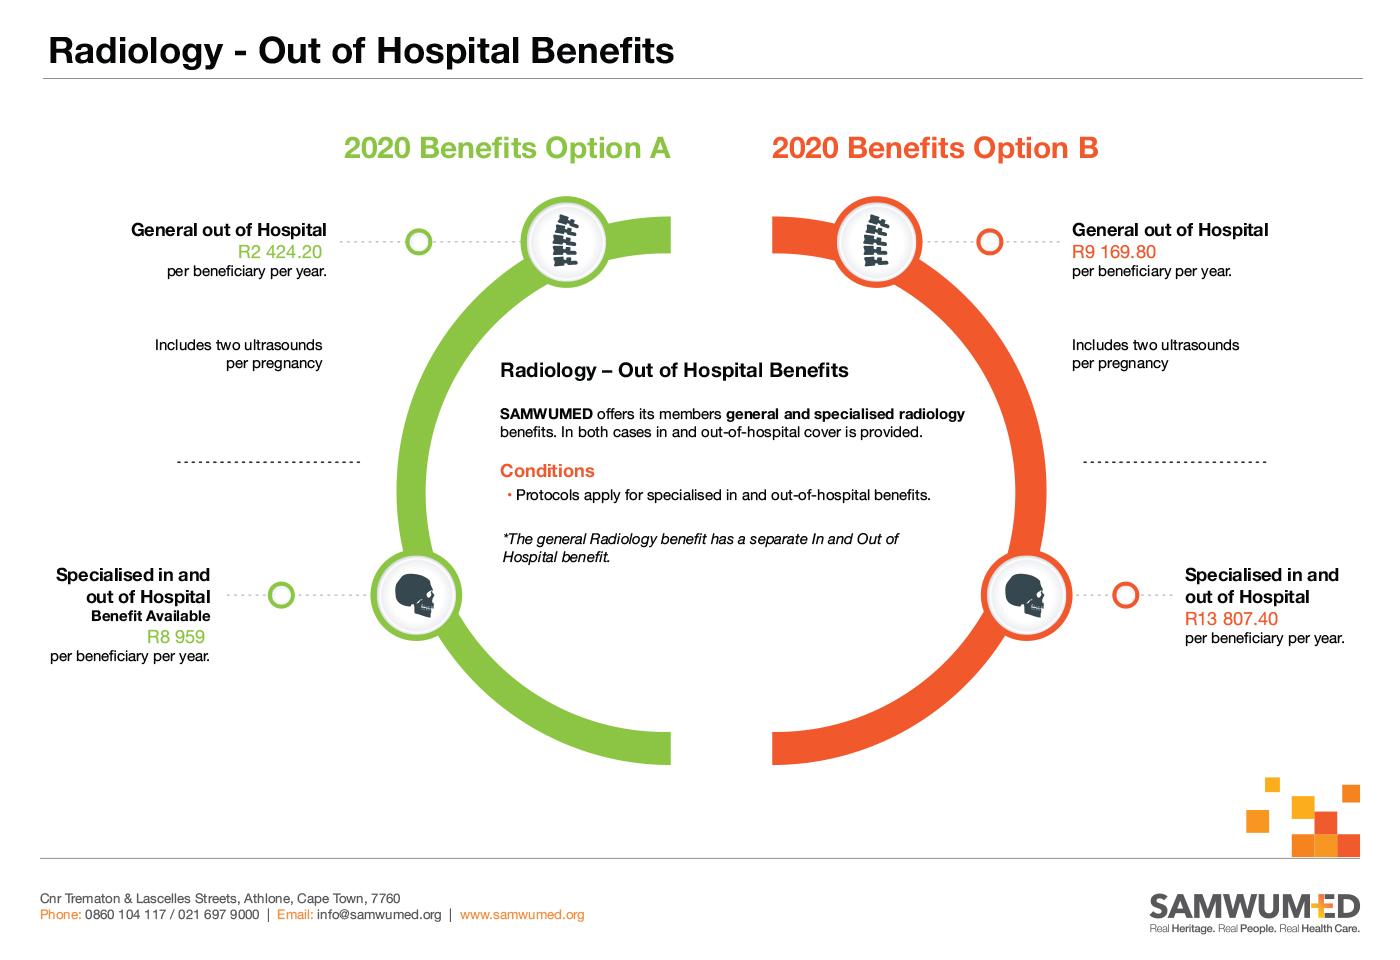 SAMWUMED Radiology - Out of Hospital Benefits